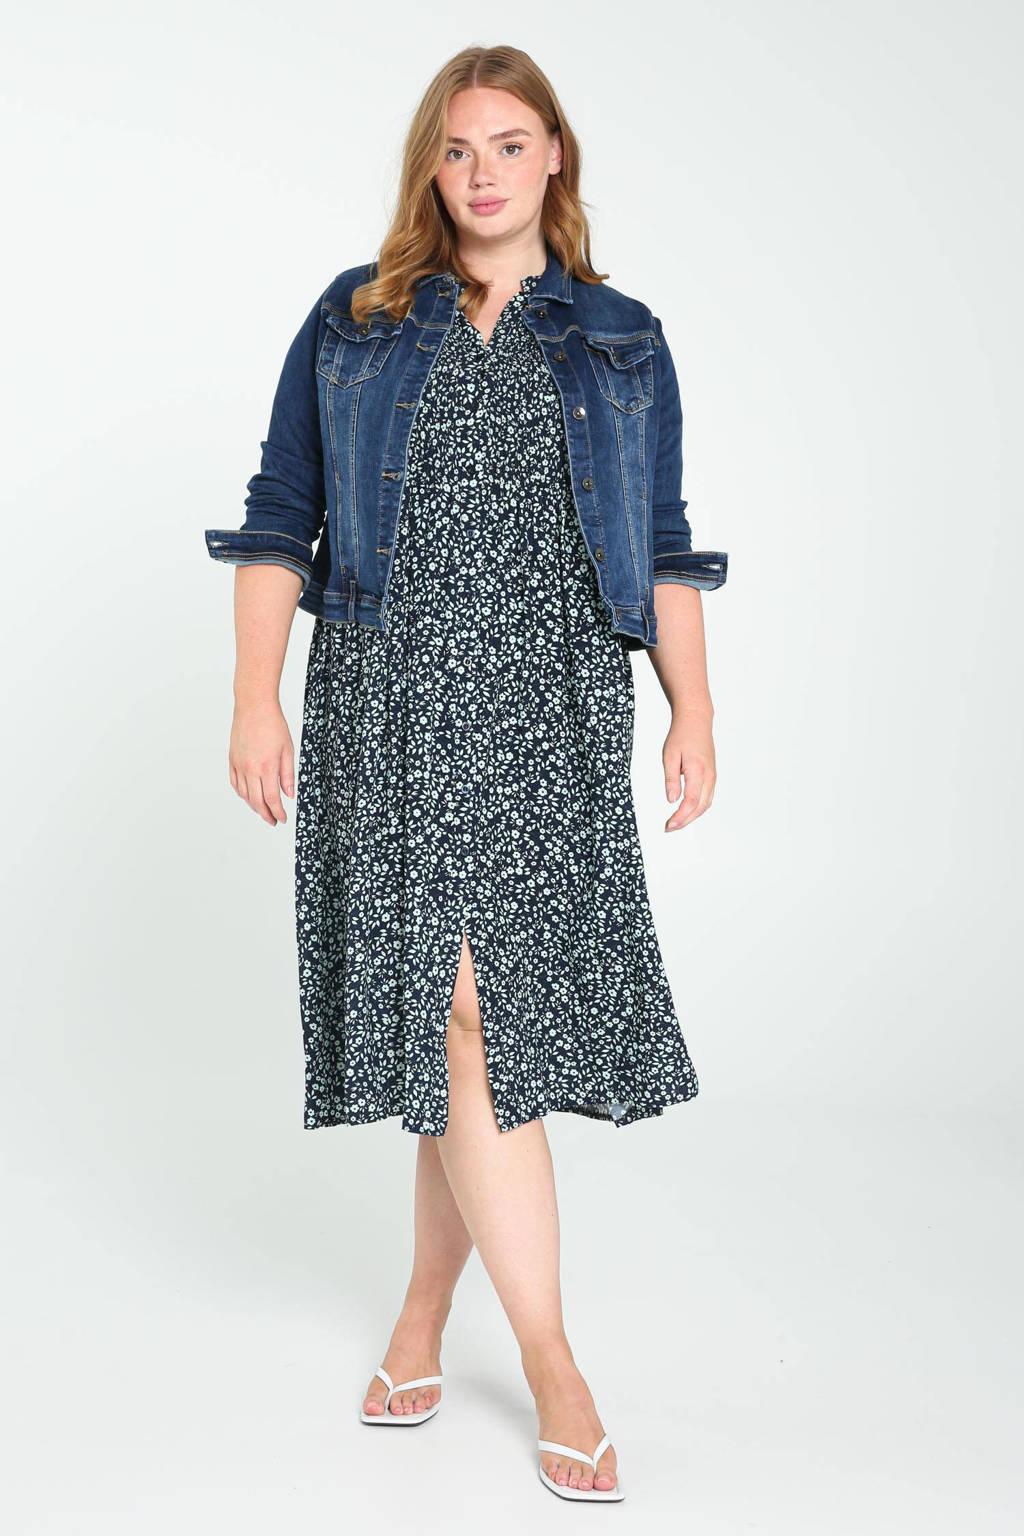 Paprika gebloemde jurk marine/ mintgroen, Marine/ mintgroen